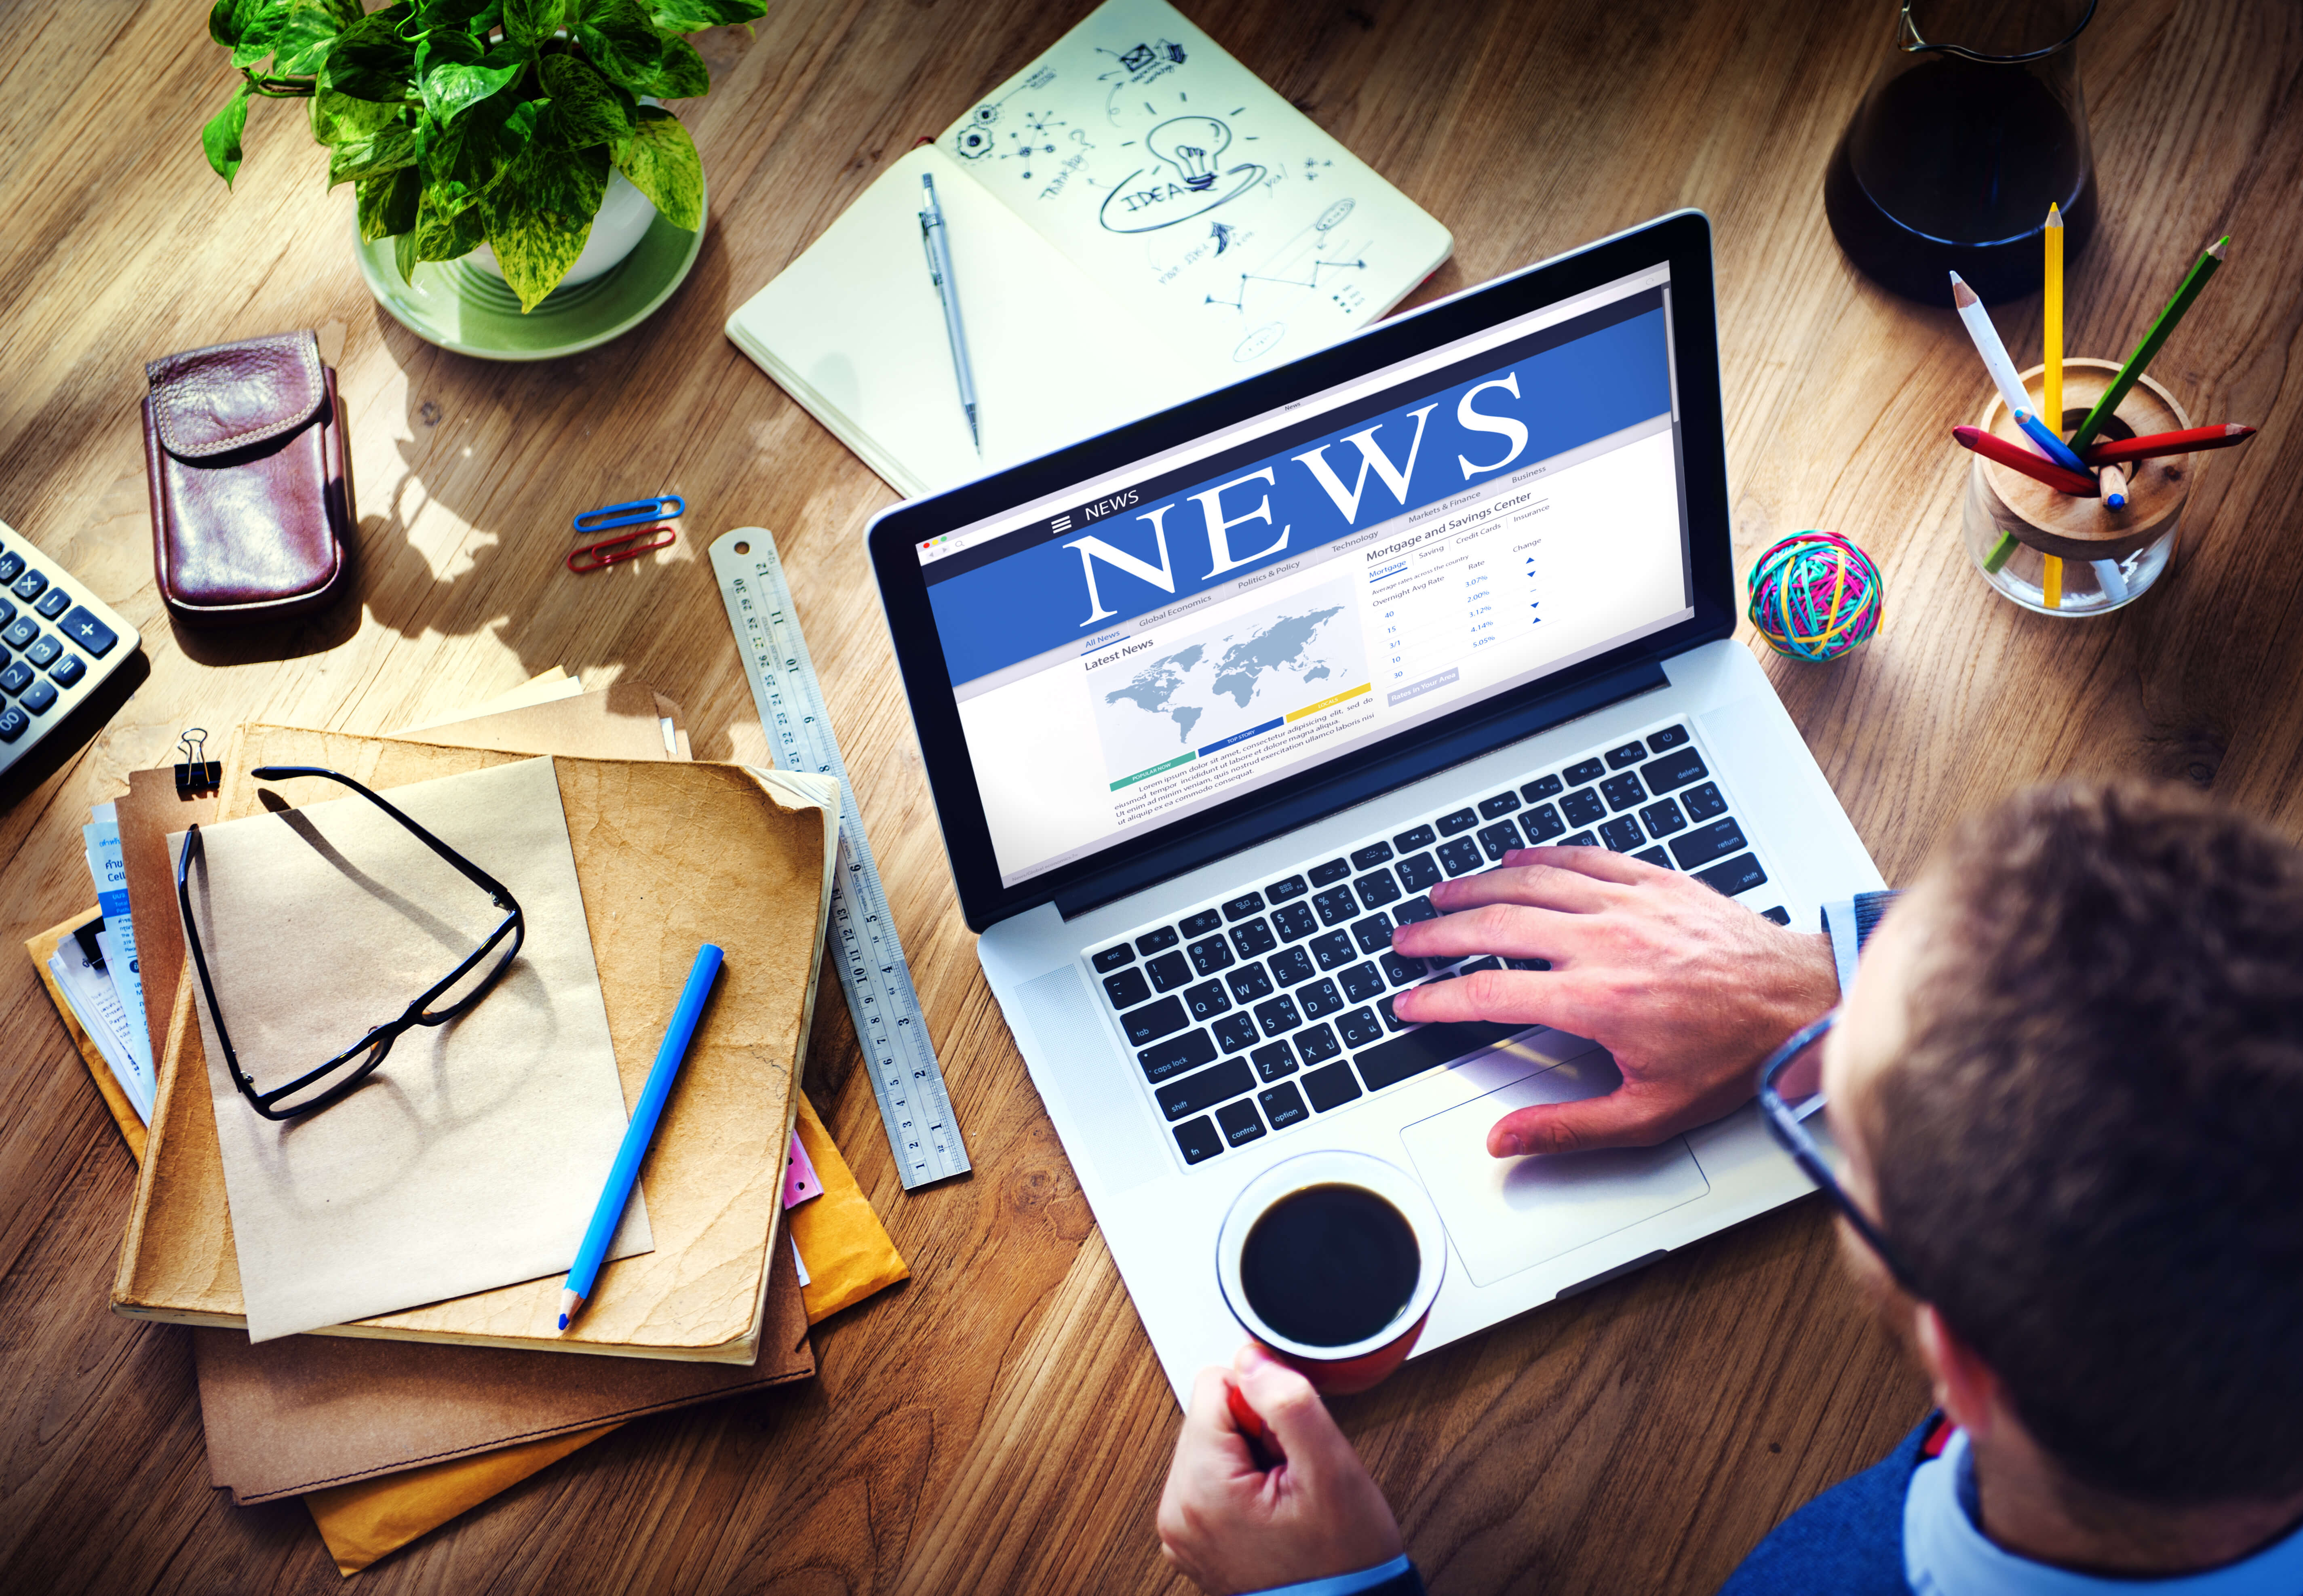 News publication on laptop screen